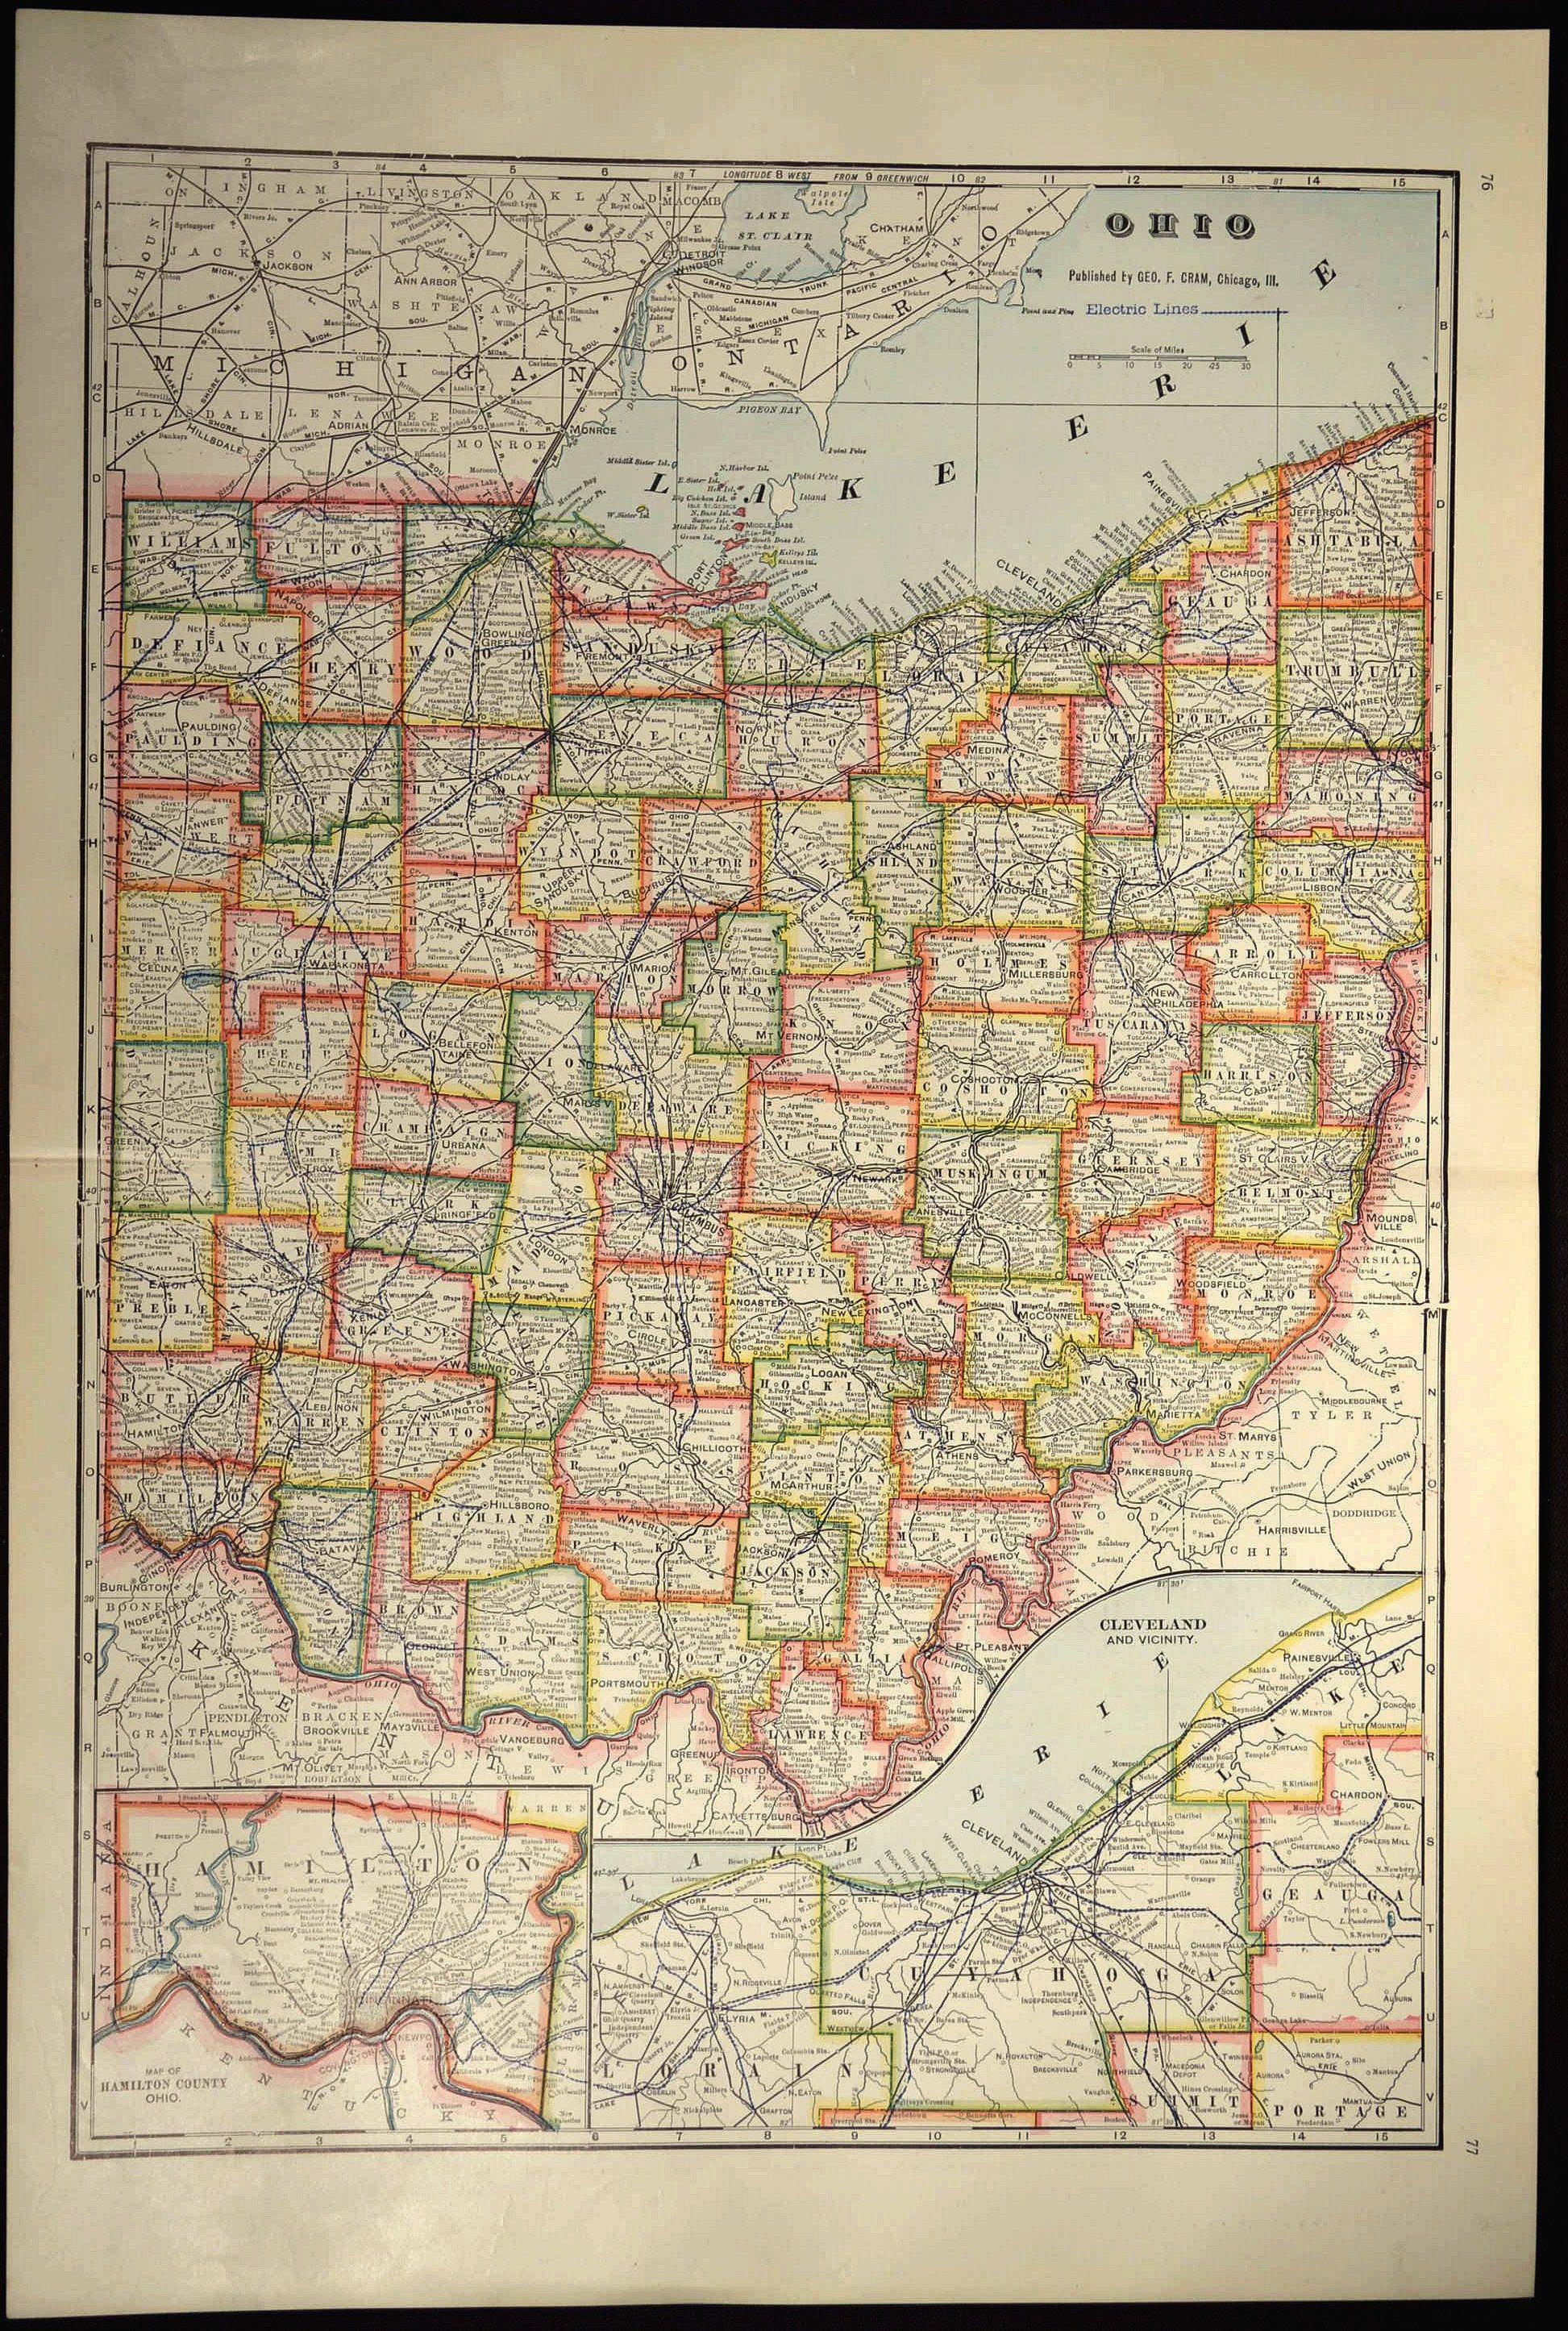 Ohio Map of Ohio Wall Decor Art LARGE Antique Colorful